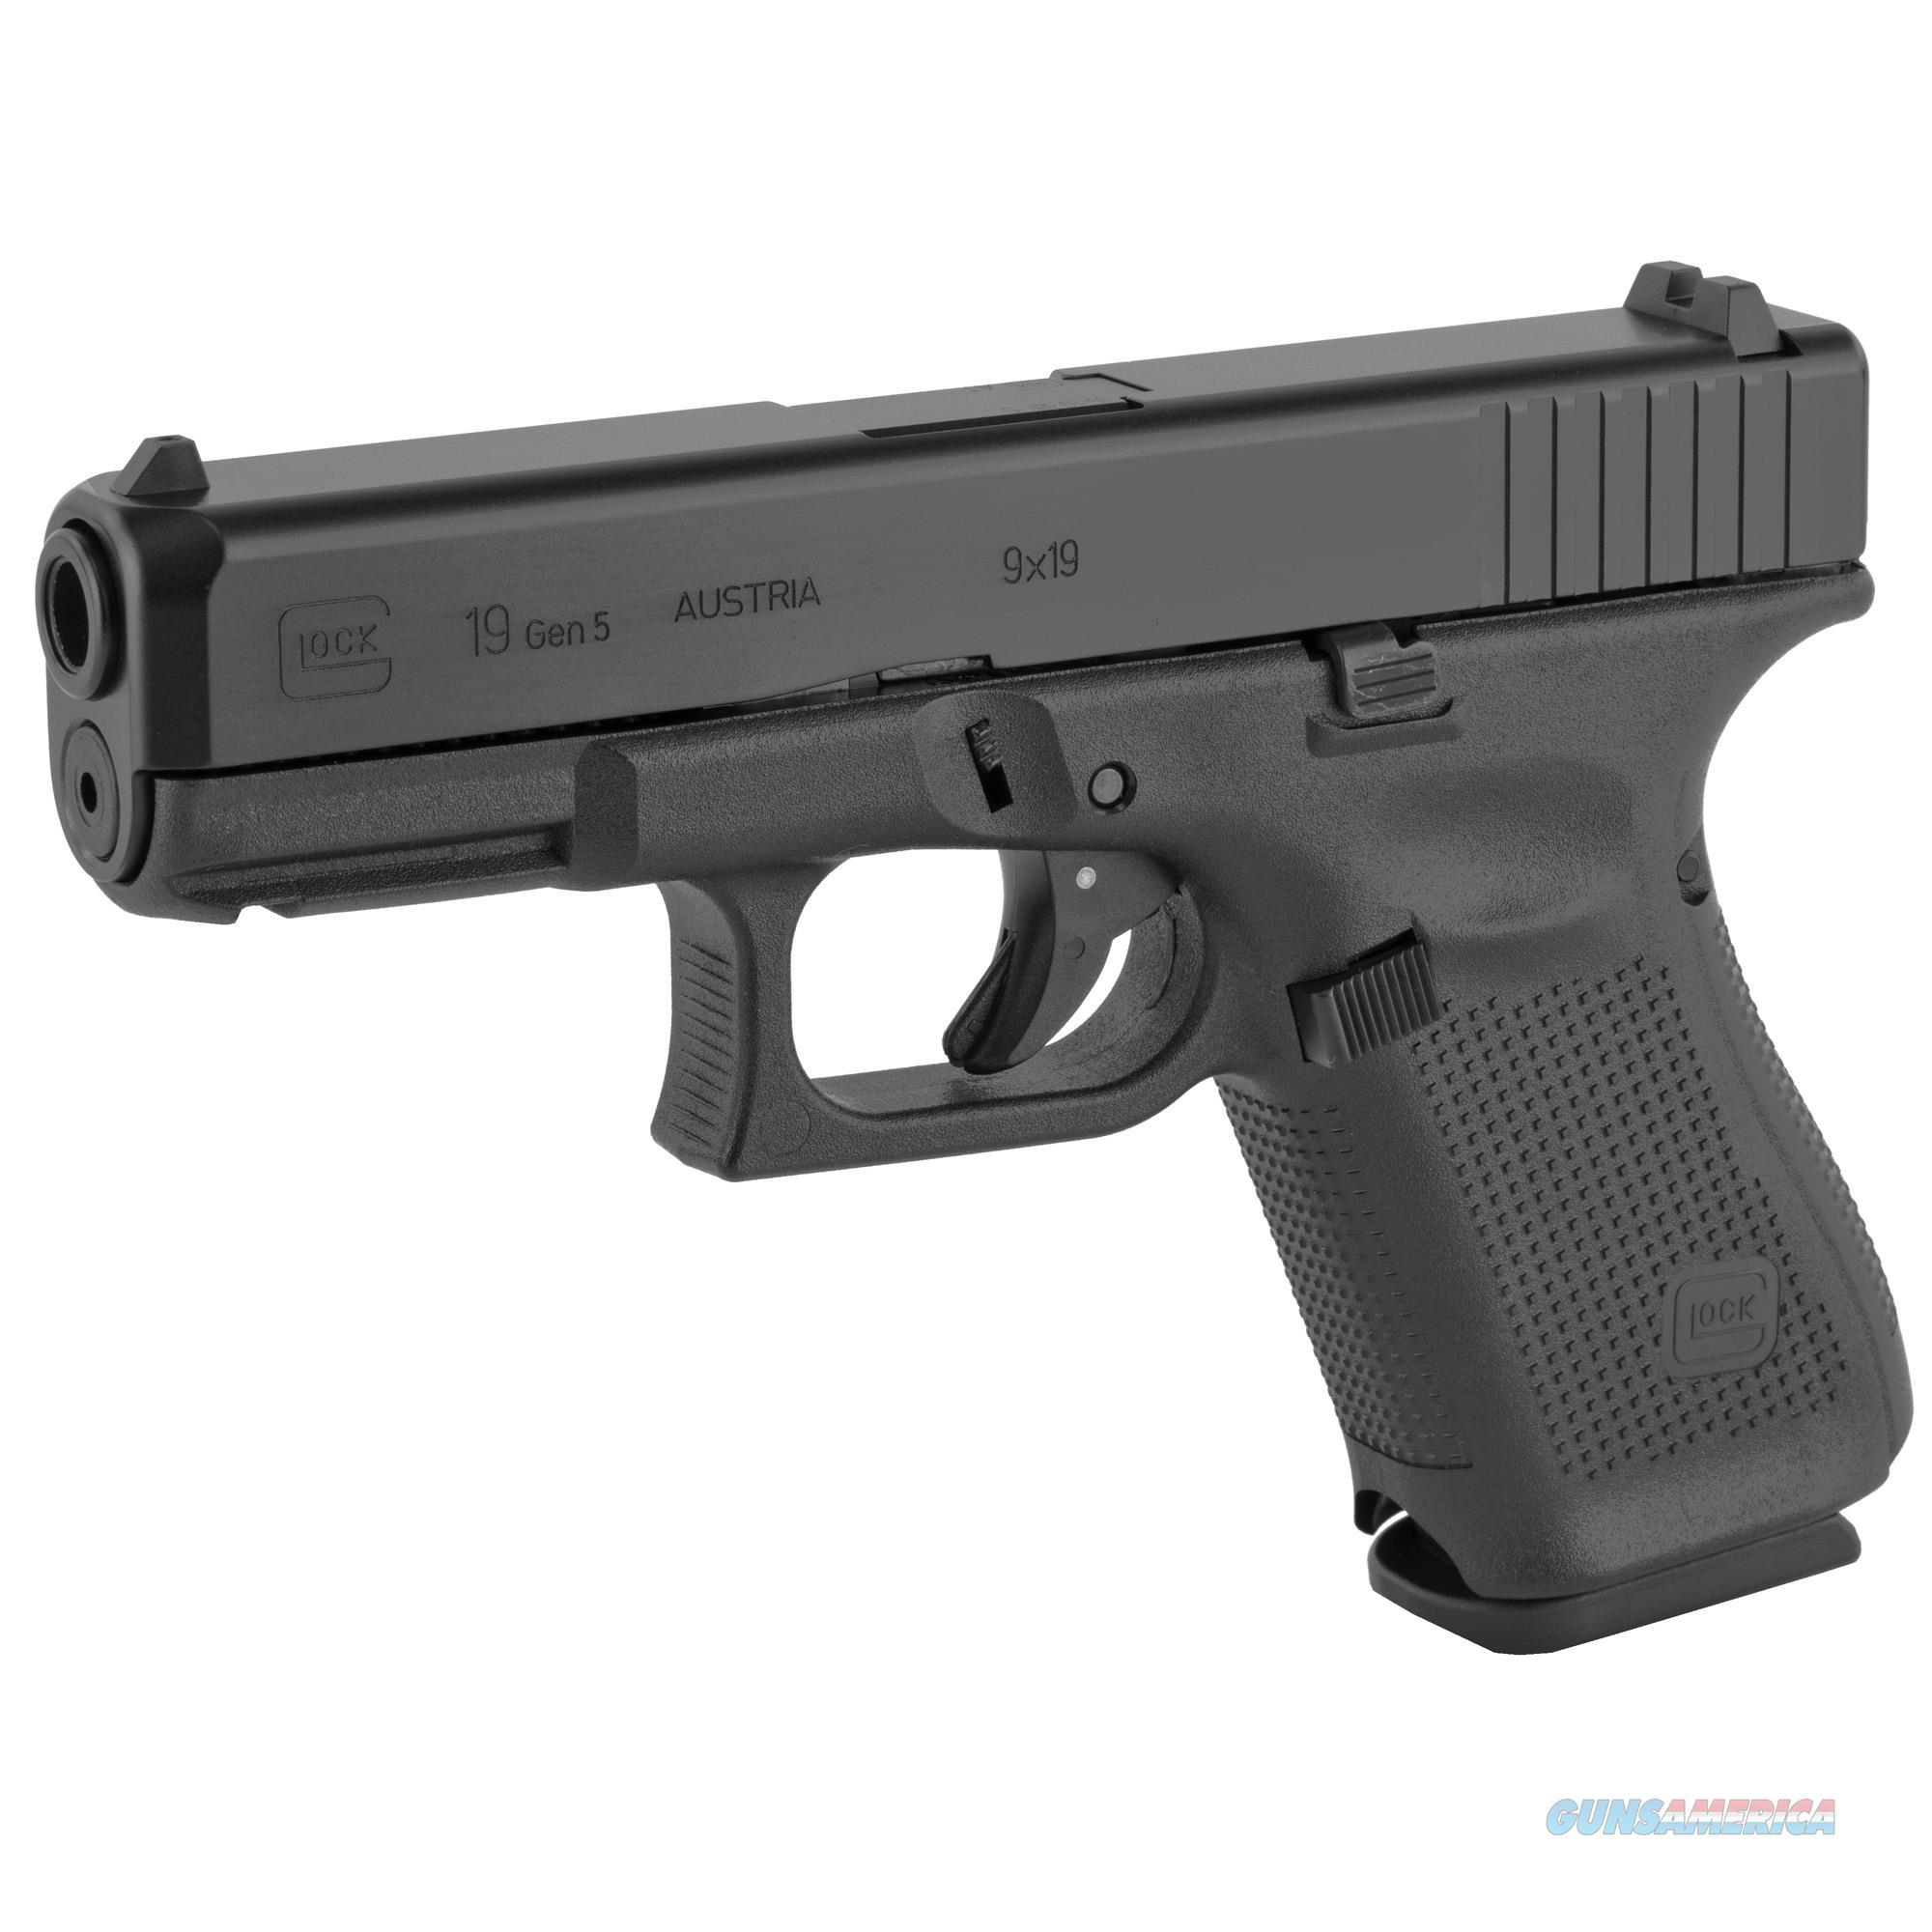 "Glock G19 Gen5 9mm Luger 4.02"" 15+1 - New in Case!  Guns > Pistols > Glock Pistols > 19/19X"